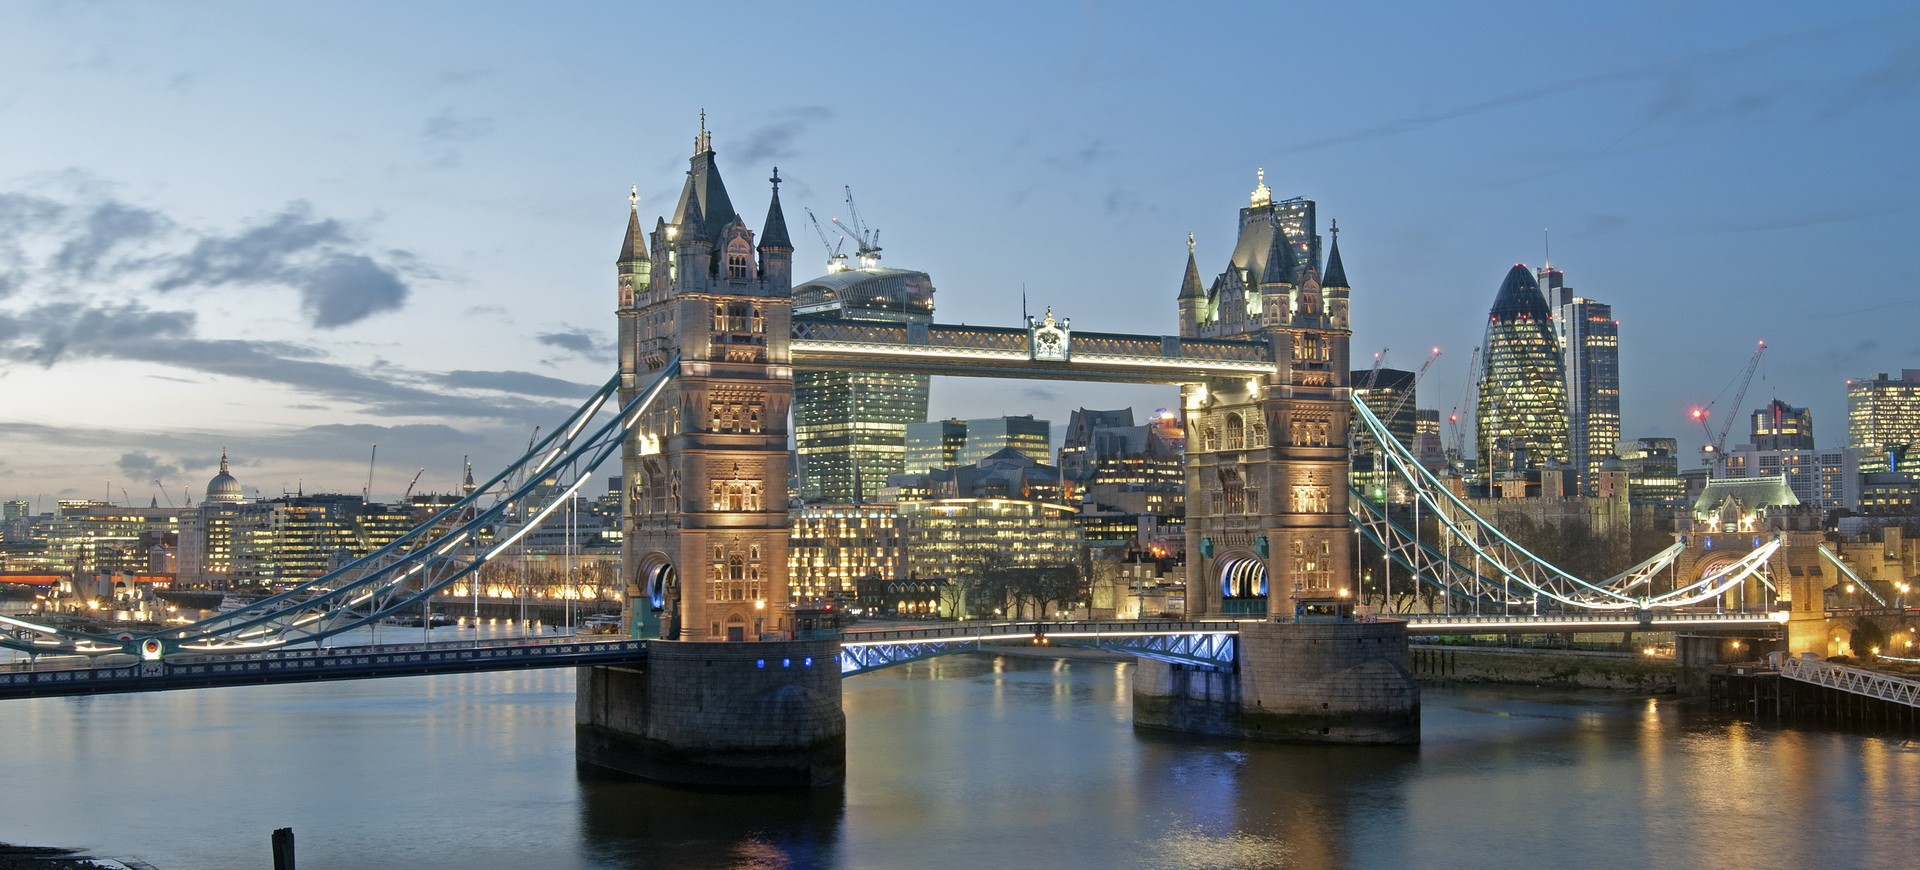 Royaume Uni Londres London Bridge by night